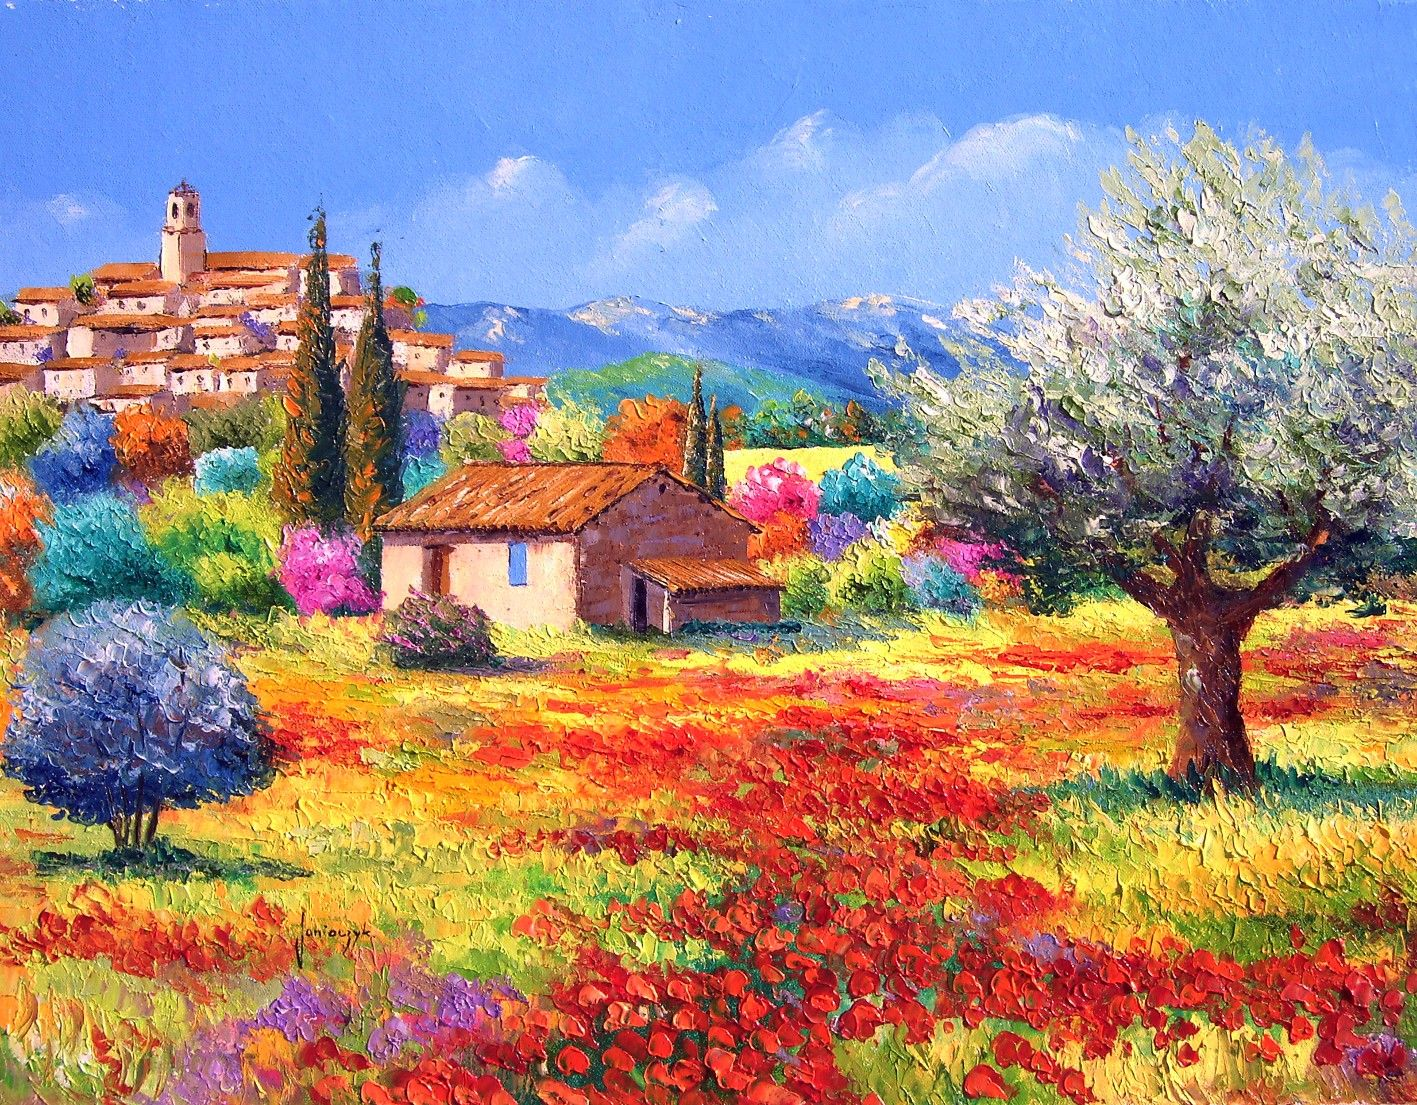 JM JANIACZYK - Le village perché. | Beautiful PROVENCE | Pinterest ...